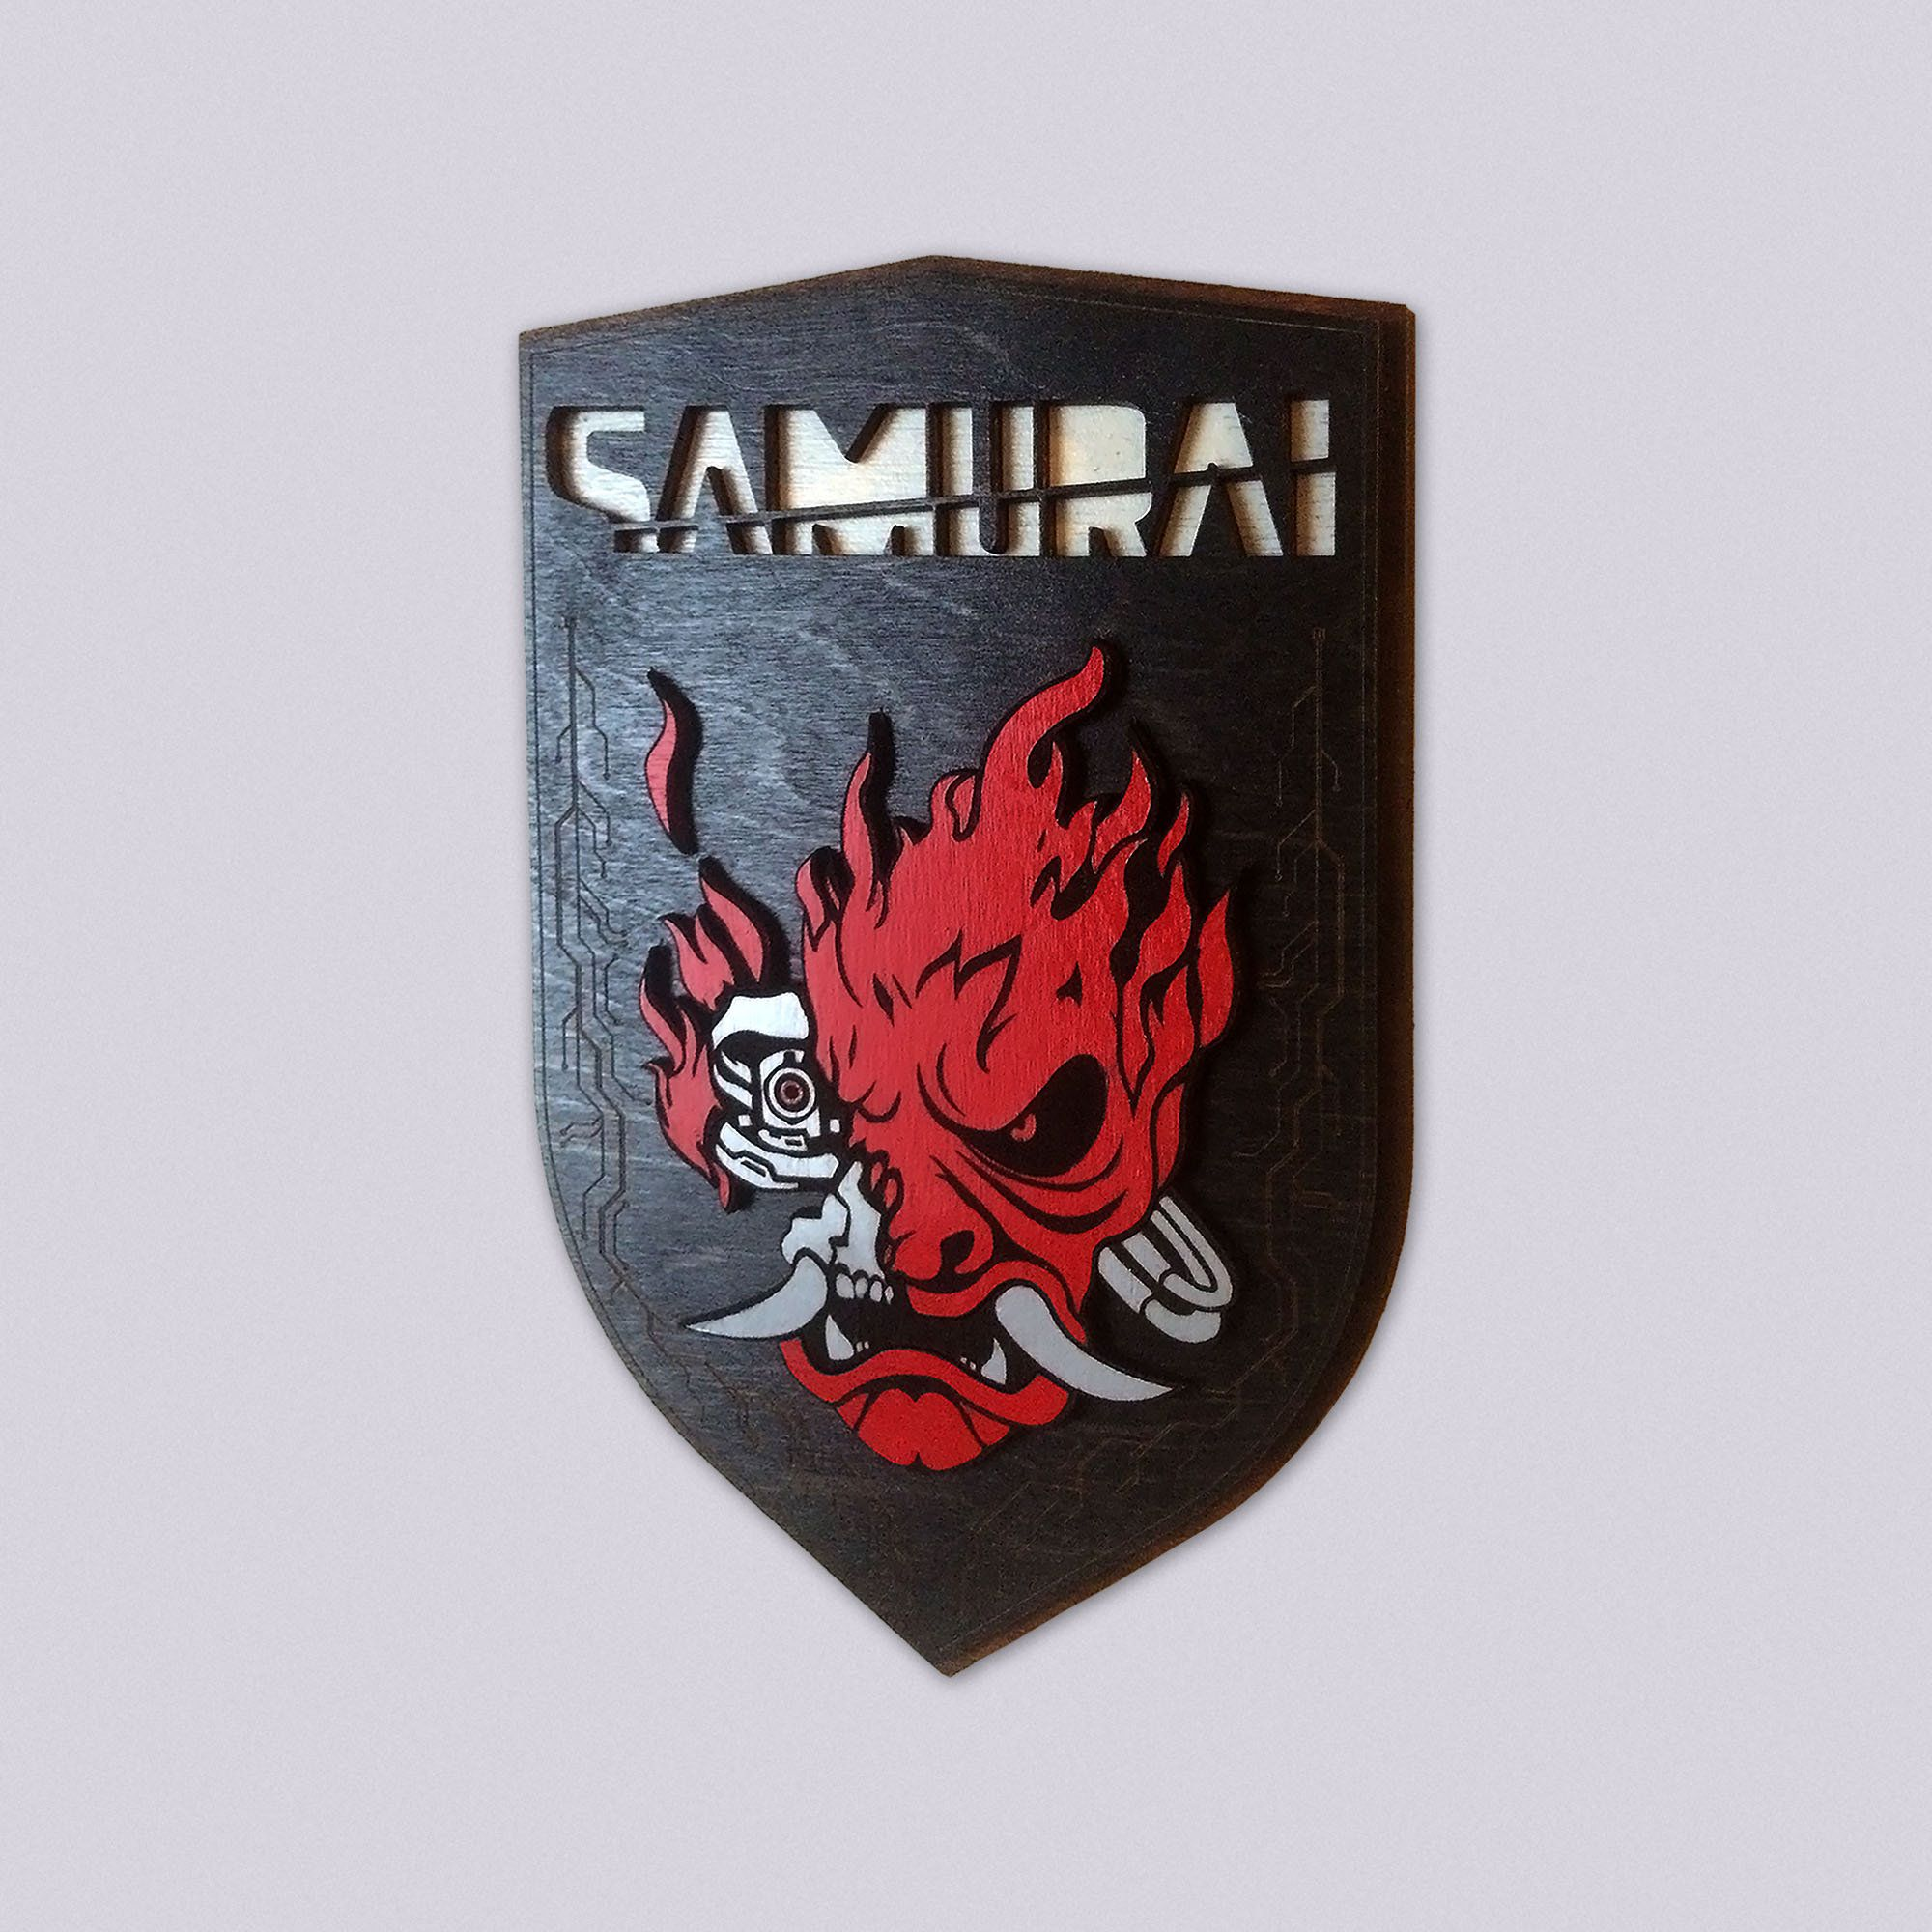 Cyberpunk 2077 Samurai Wall Art Shield Crest Of Oni Cyberdemon Geek Wall Decor By Gabelaser On Etsy Wall Art Cyberpunk 2077 Art